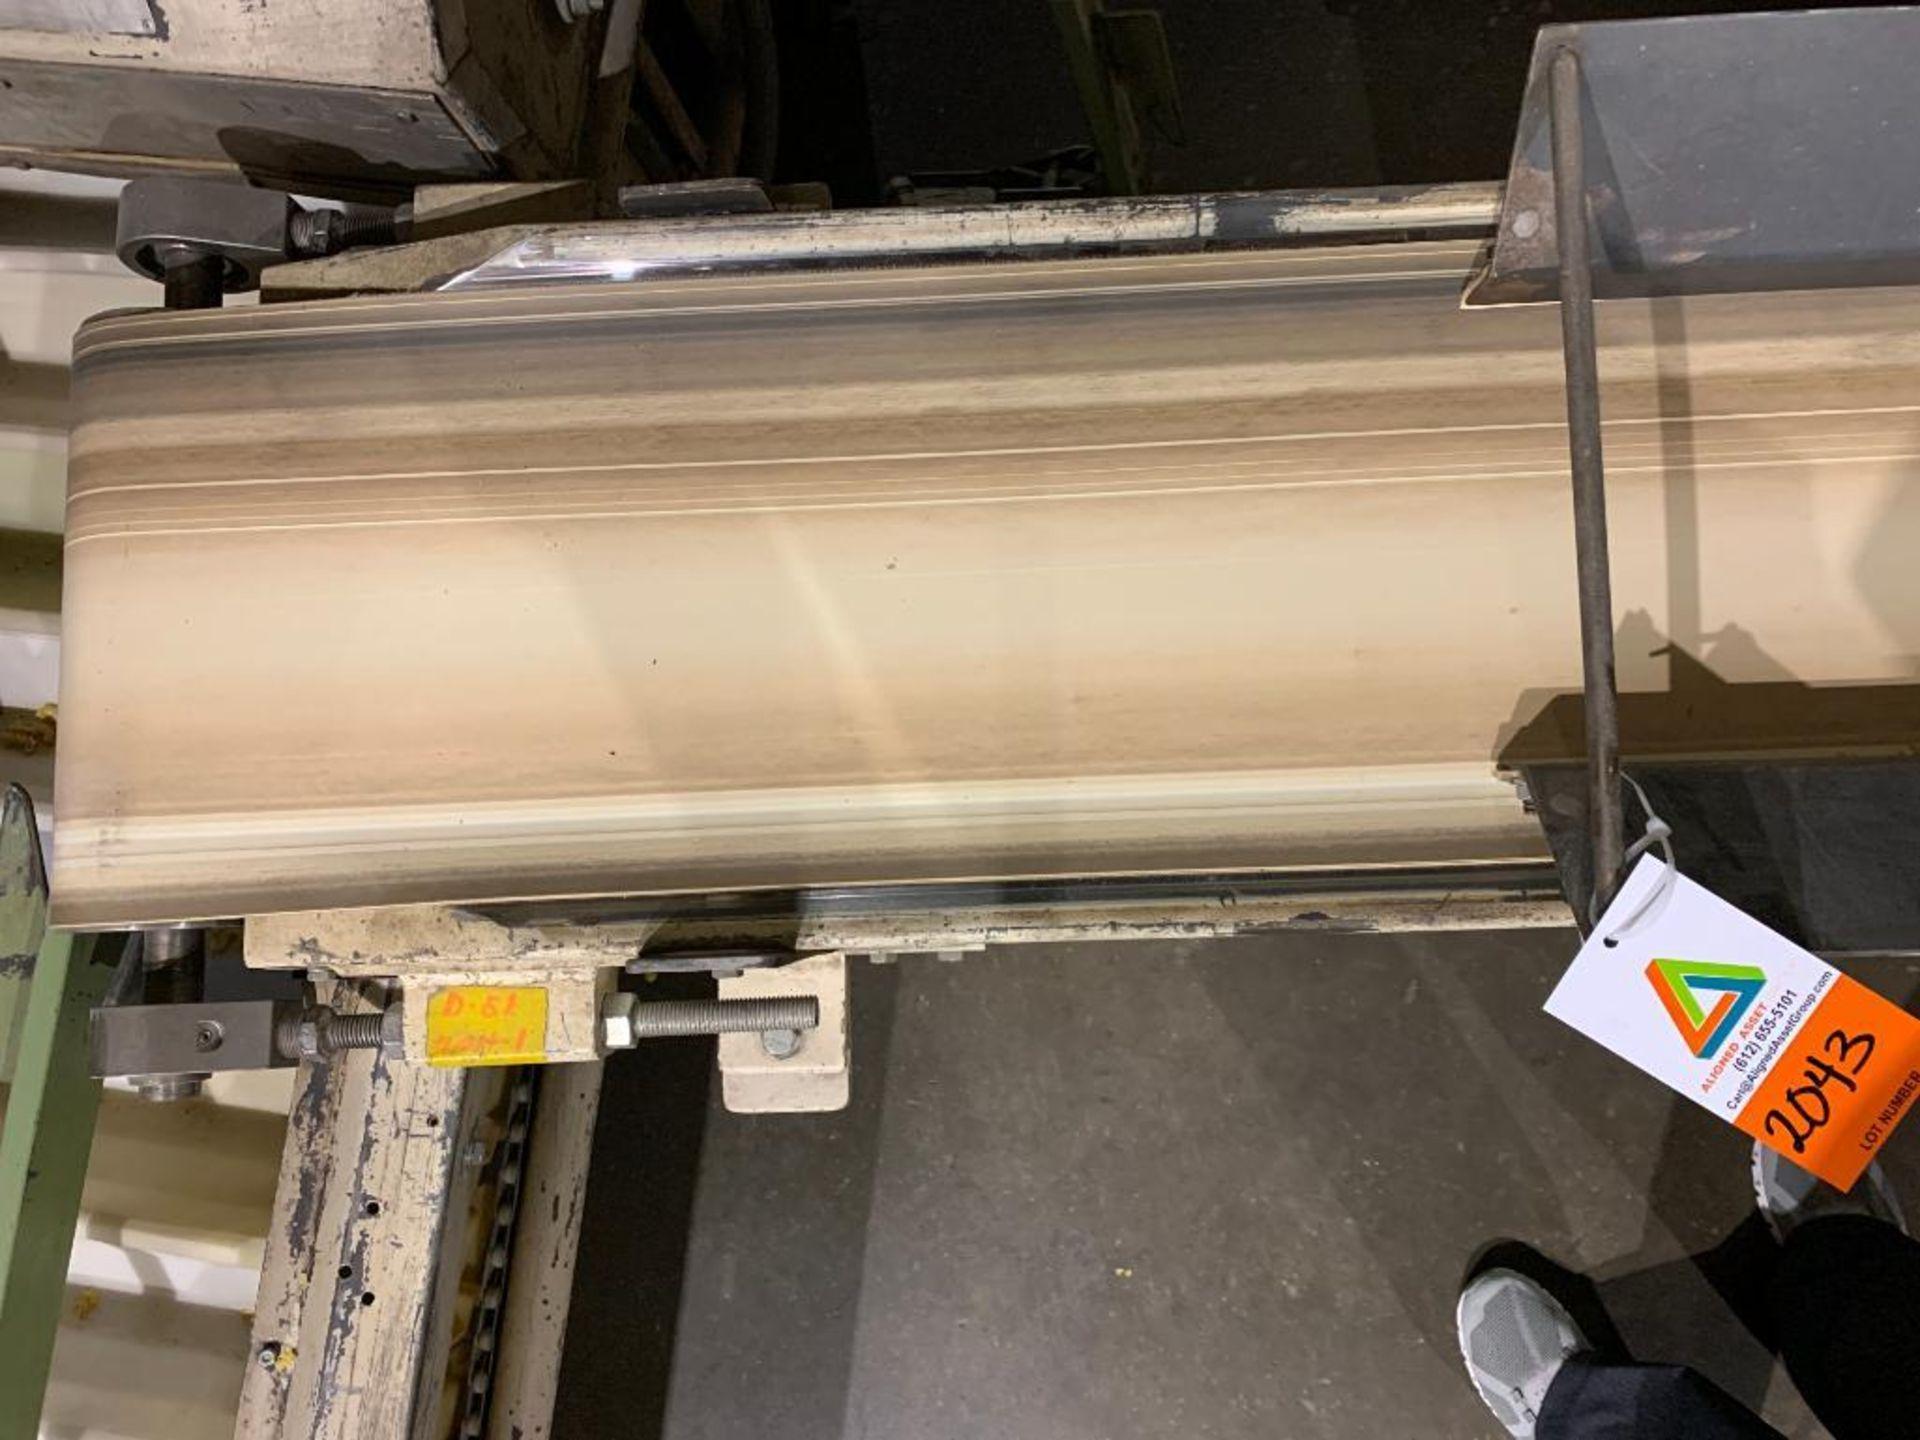 mild steel conveyor - Image 7 of 9